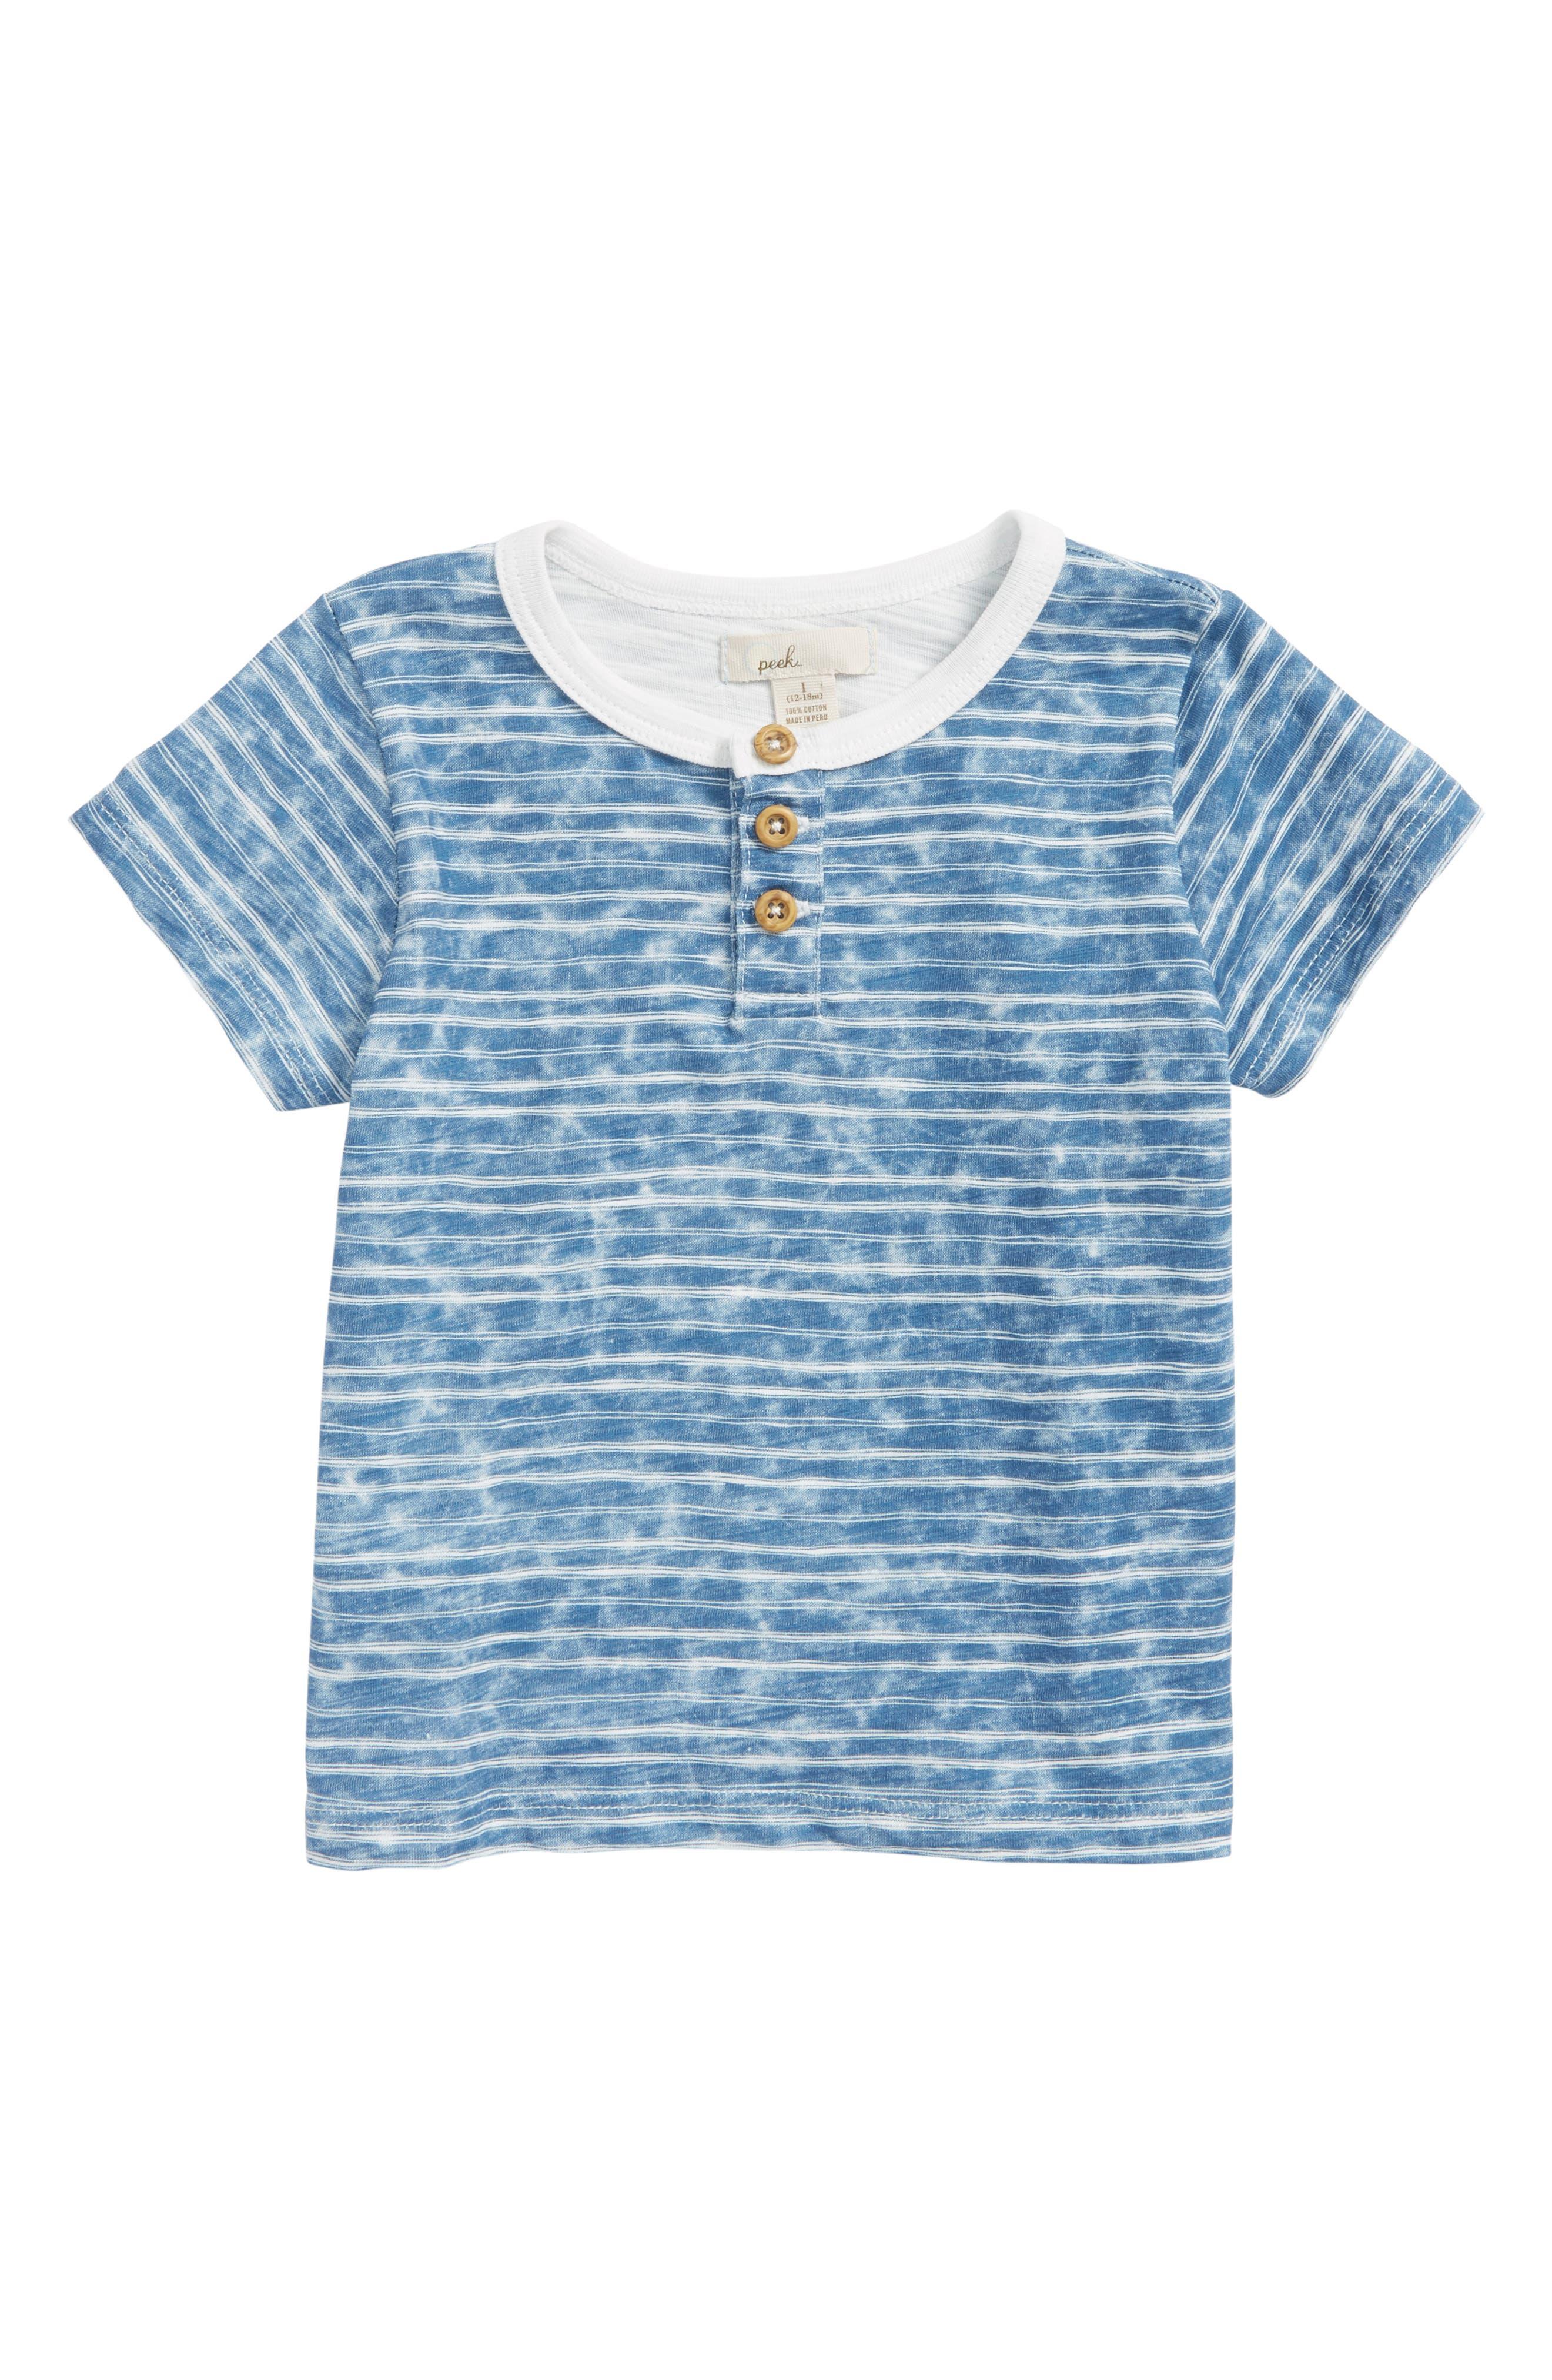 Peek Brandon T-Shirt,                         Main,                         color, Navy